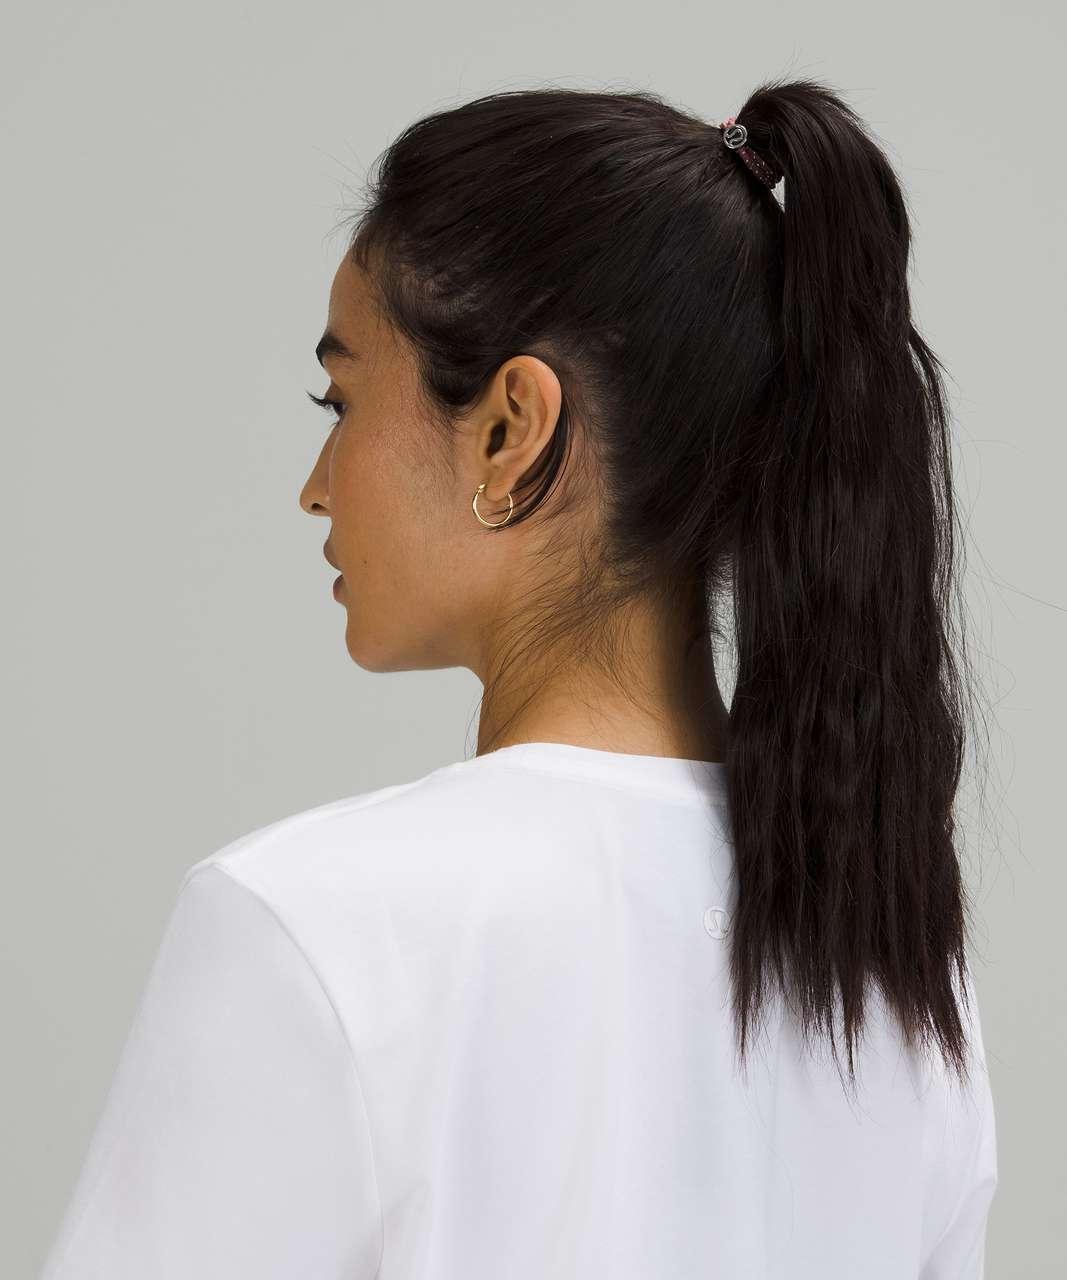 Lululemon Glow On Hair Ties - Ocean Air / Crispin Green / Spiced Chai